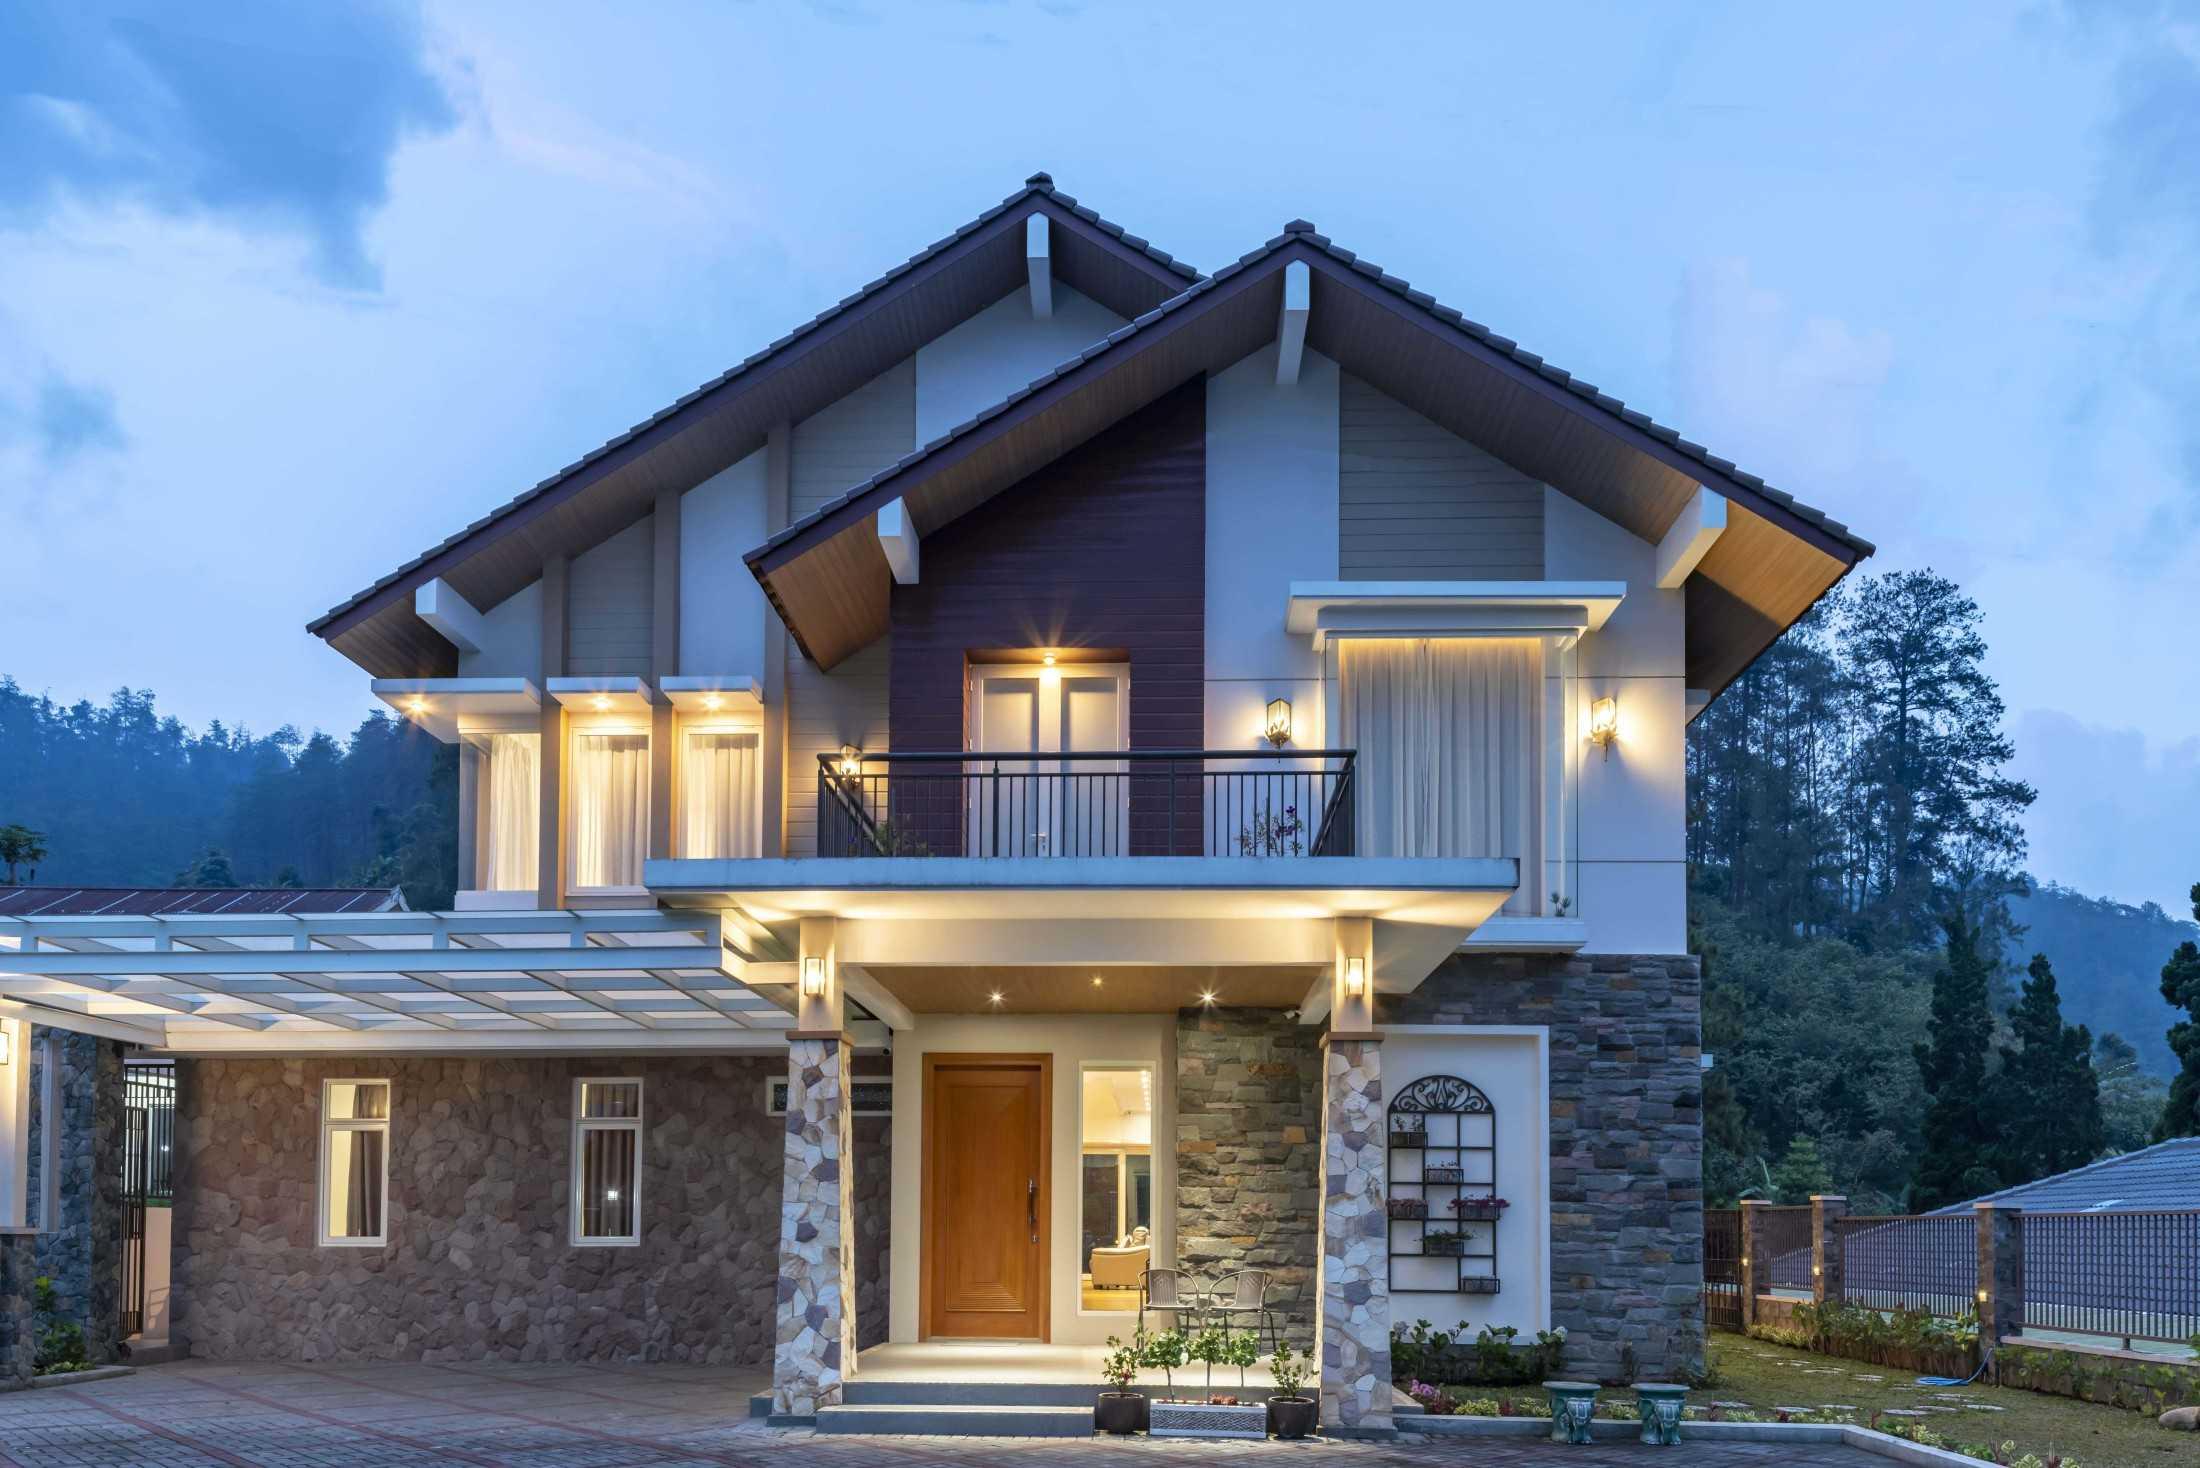 Conarch Studio Breezy Tropical Villa Kec. Tawangmangu, Kabupaten Karanganyar, Jawa Tengah, Indonesia Kec. Tawangmangu, Kabupaten Karanganyar, Jawa Tengah, Indonesia Exterior  126660